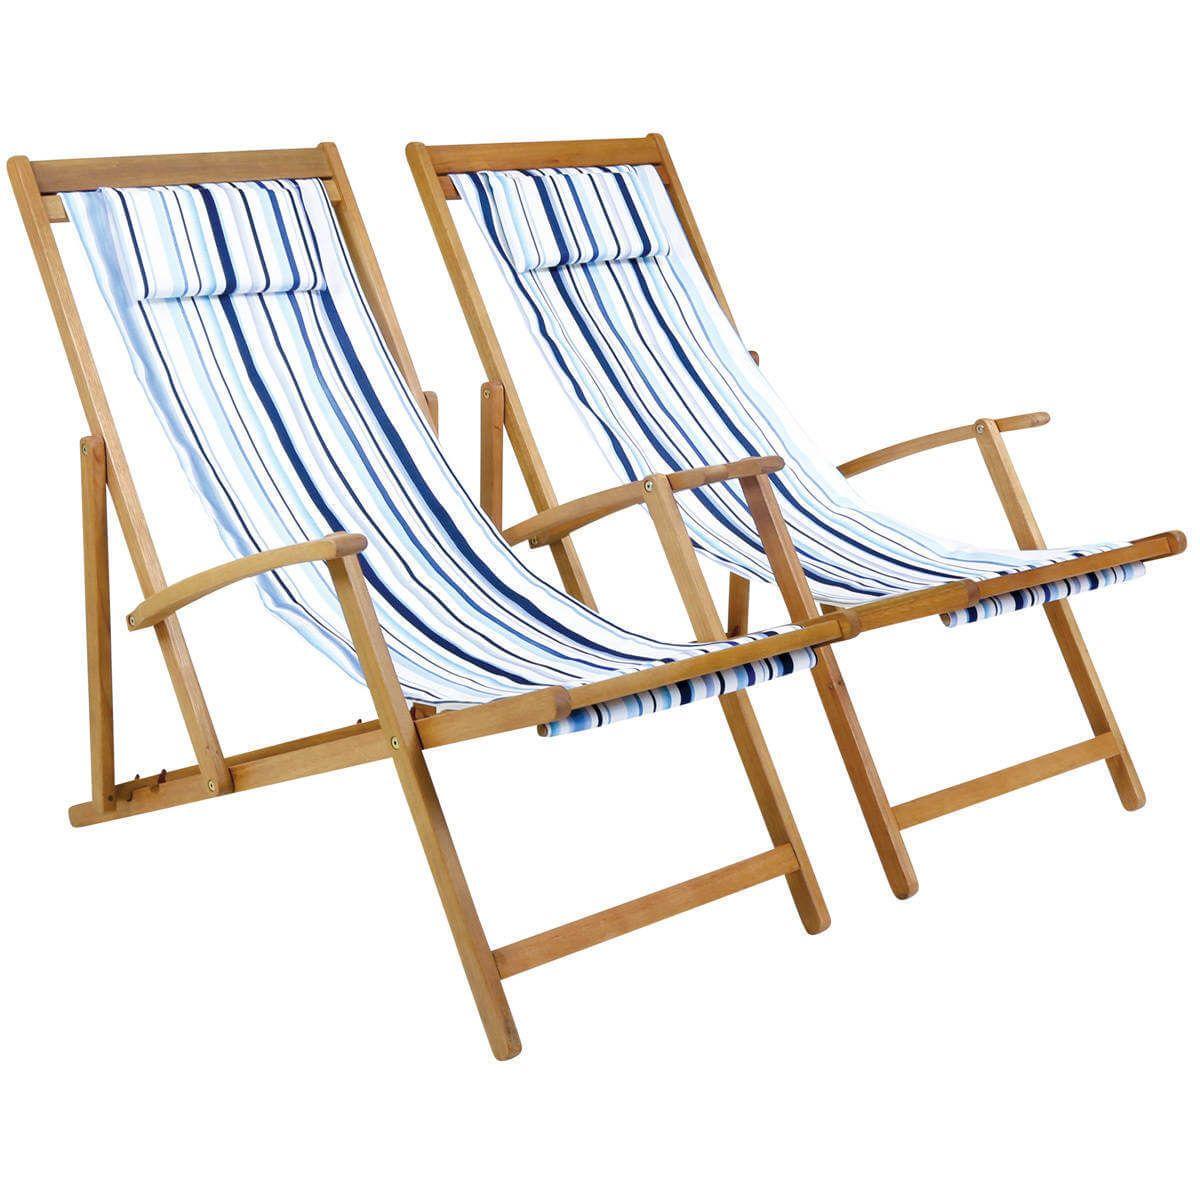 GLNTDC10PAIR-Charles-Bentley-National-Trust-Coastal-Deck-Chairs